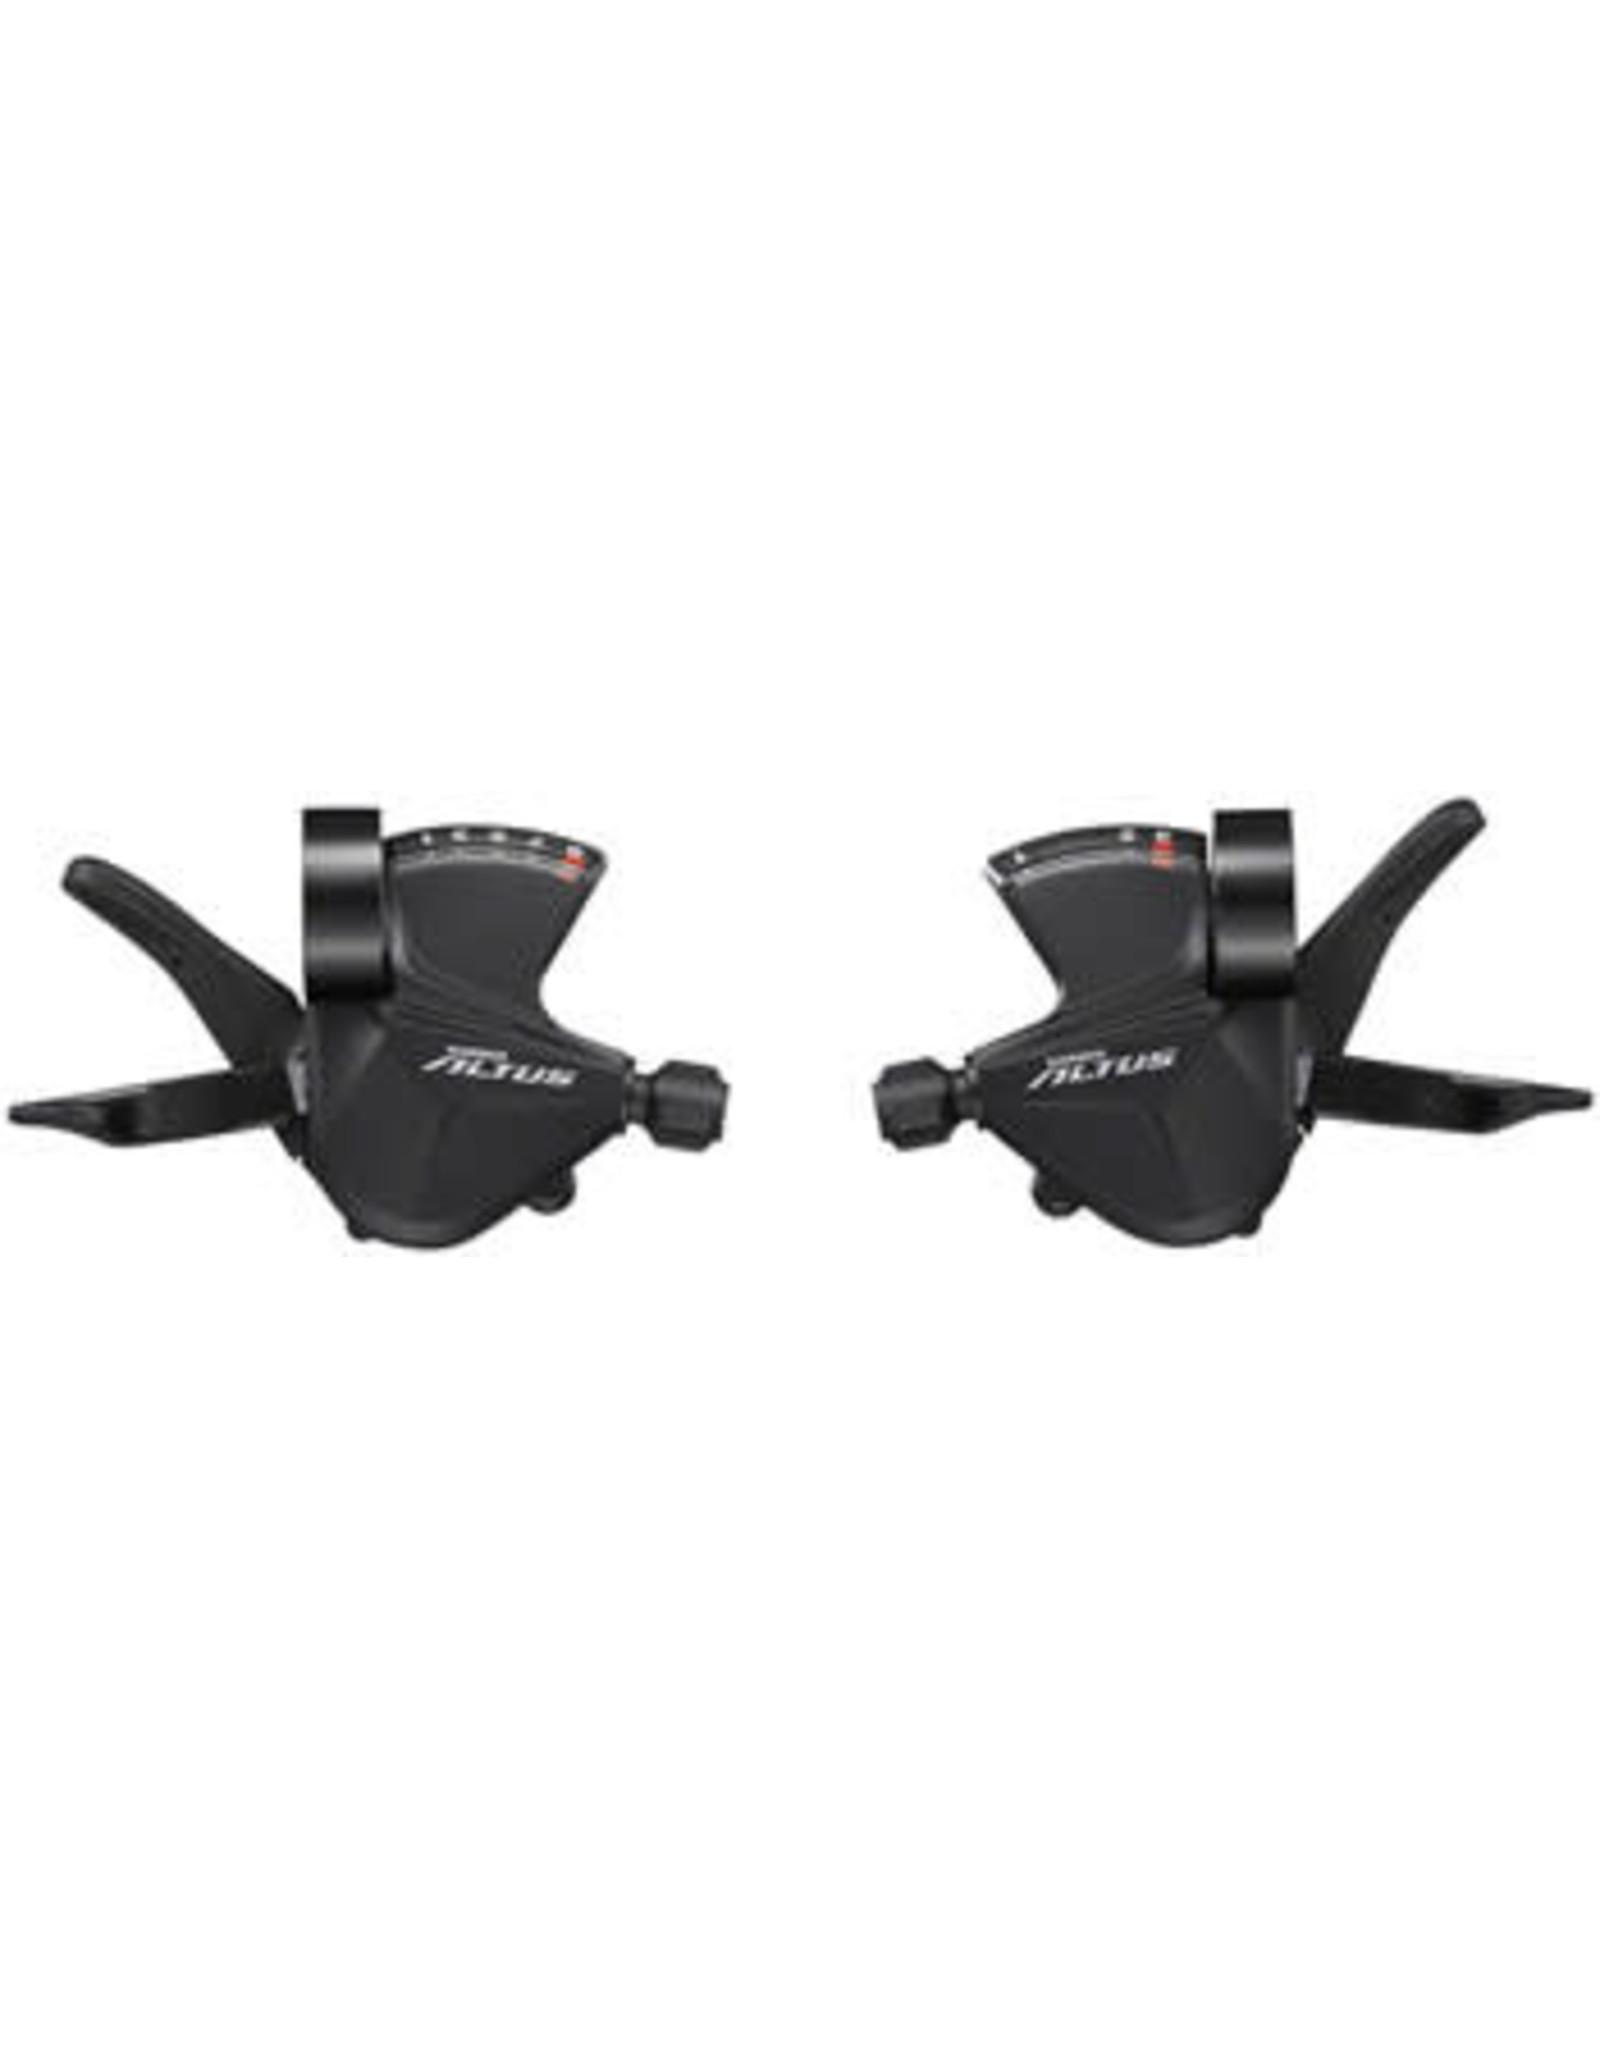 Shimano Shimano Altus SL-M2010 3x9-Speed Shift Lever Set, Black